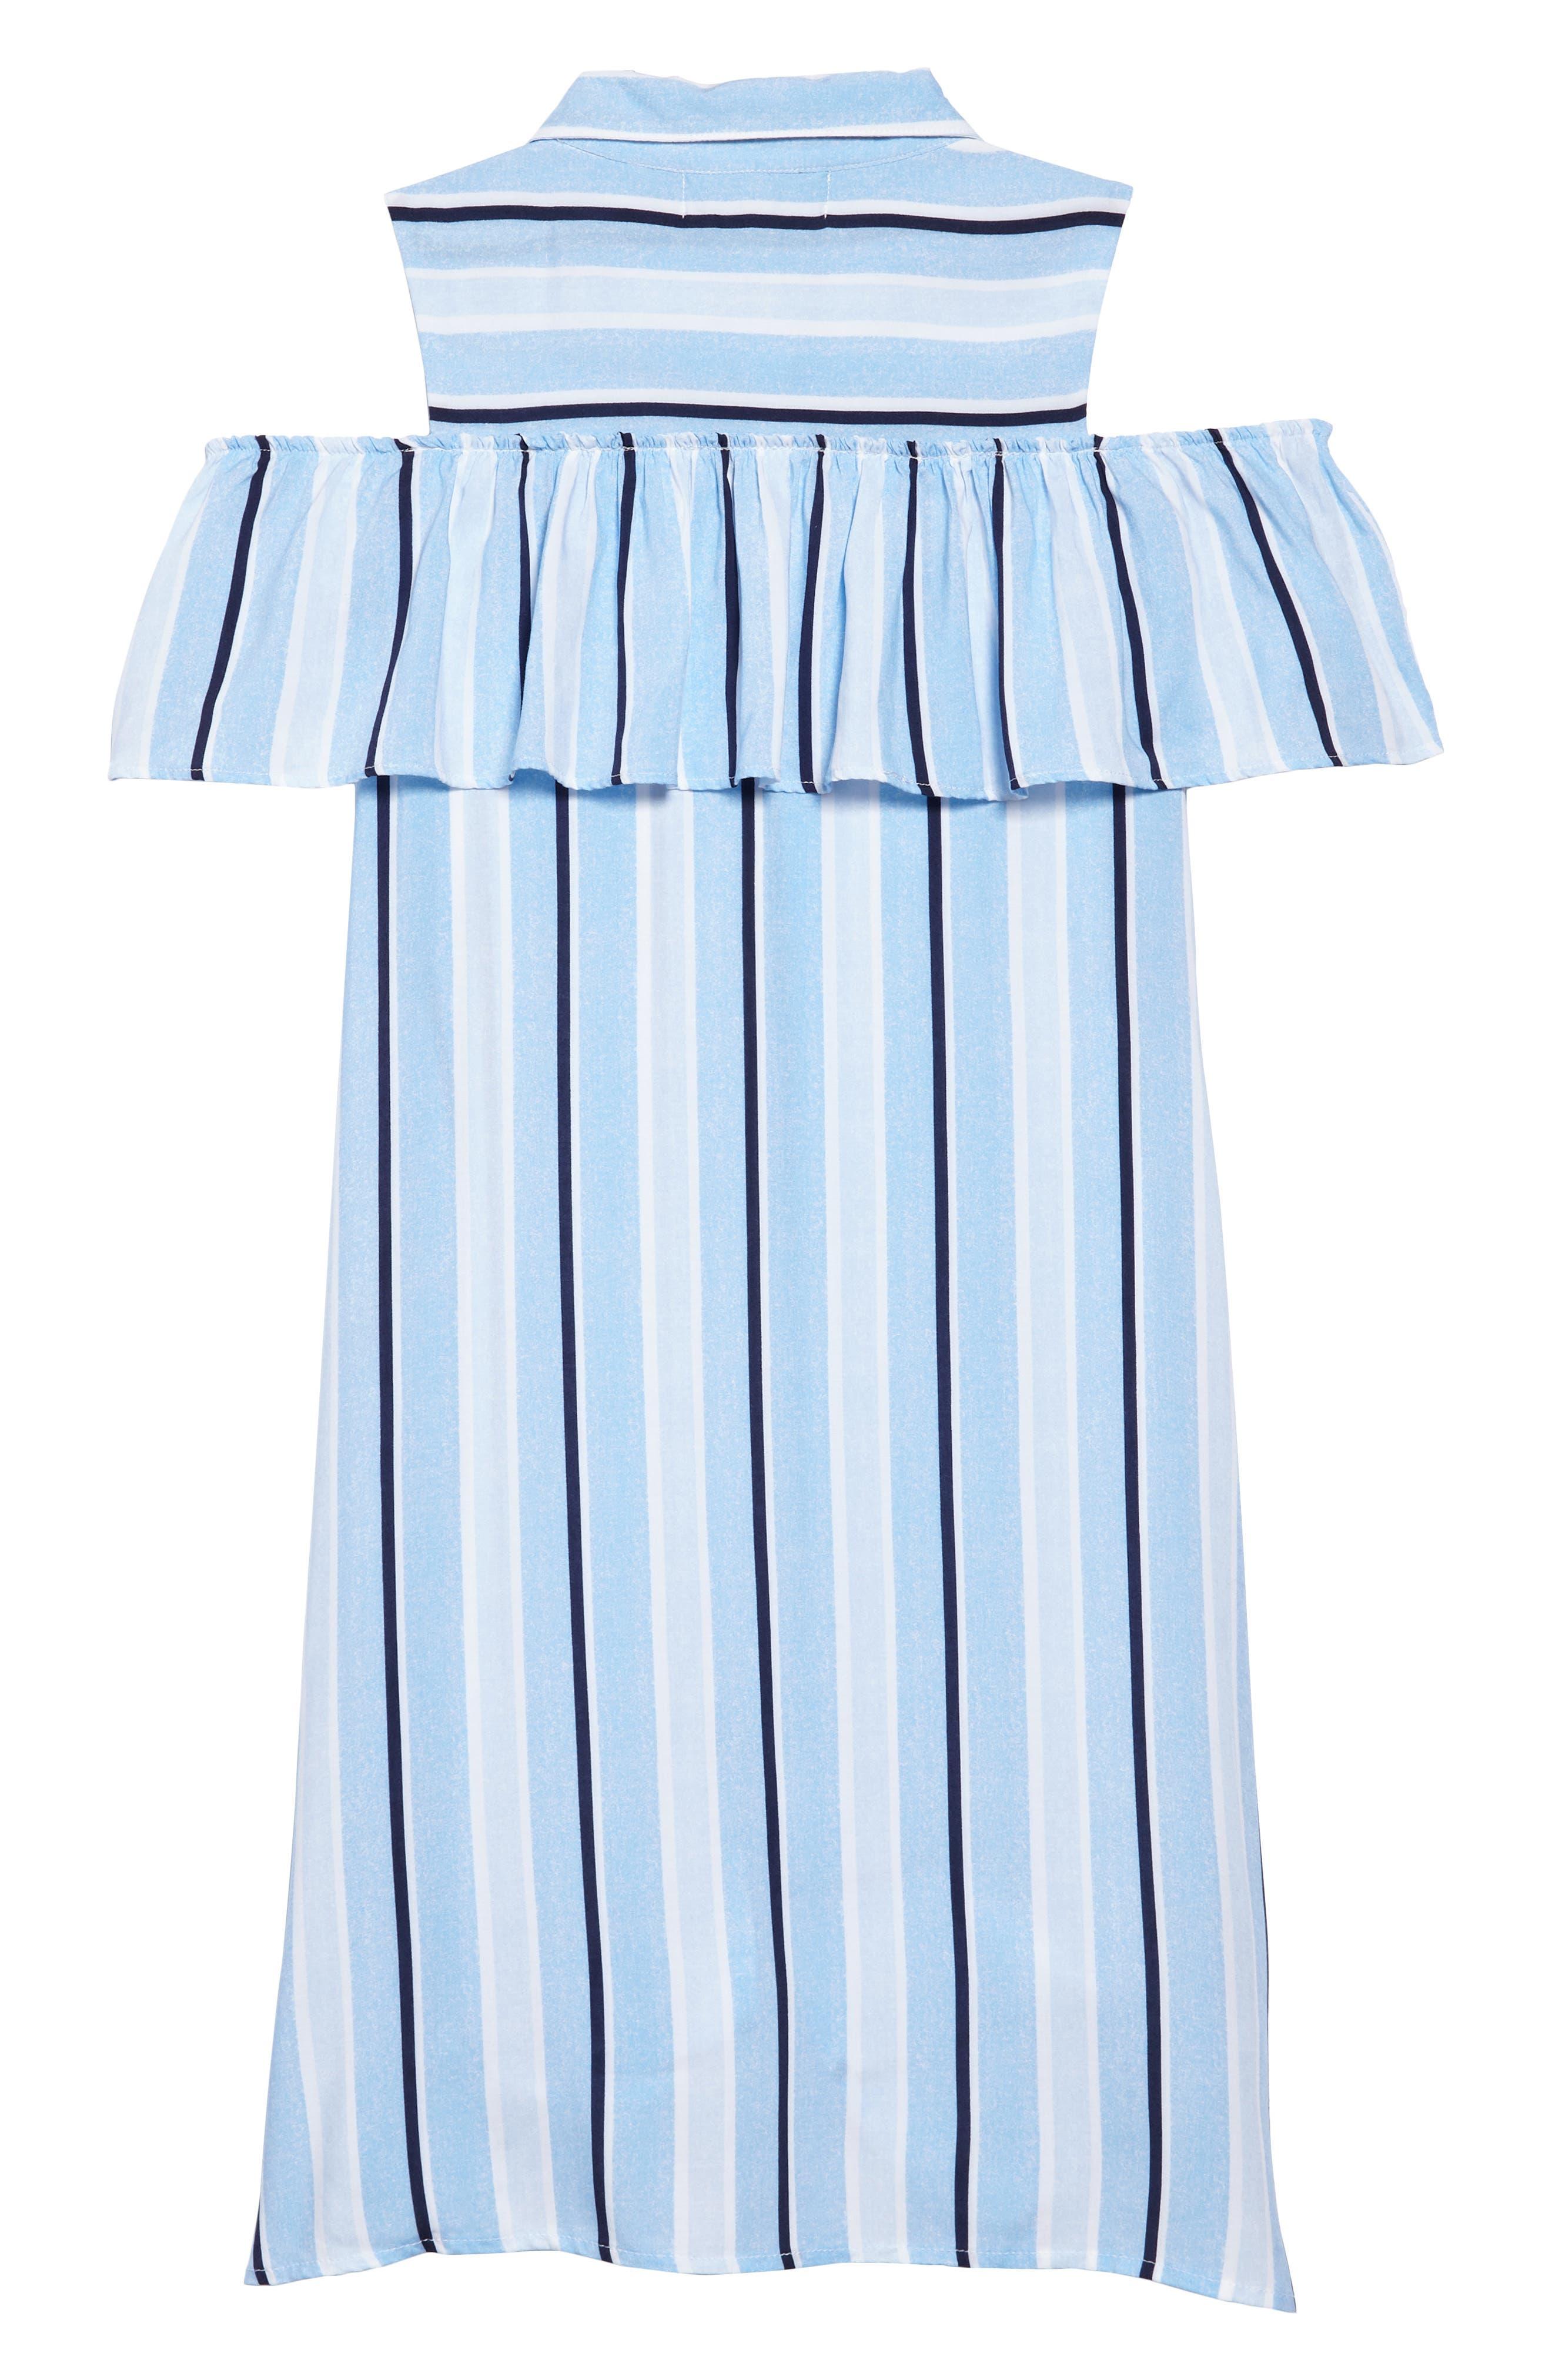 Cold Shoulder Knit Shirtdress,                             Alternate thumbnail 2, color,                             Light Blue/ White